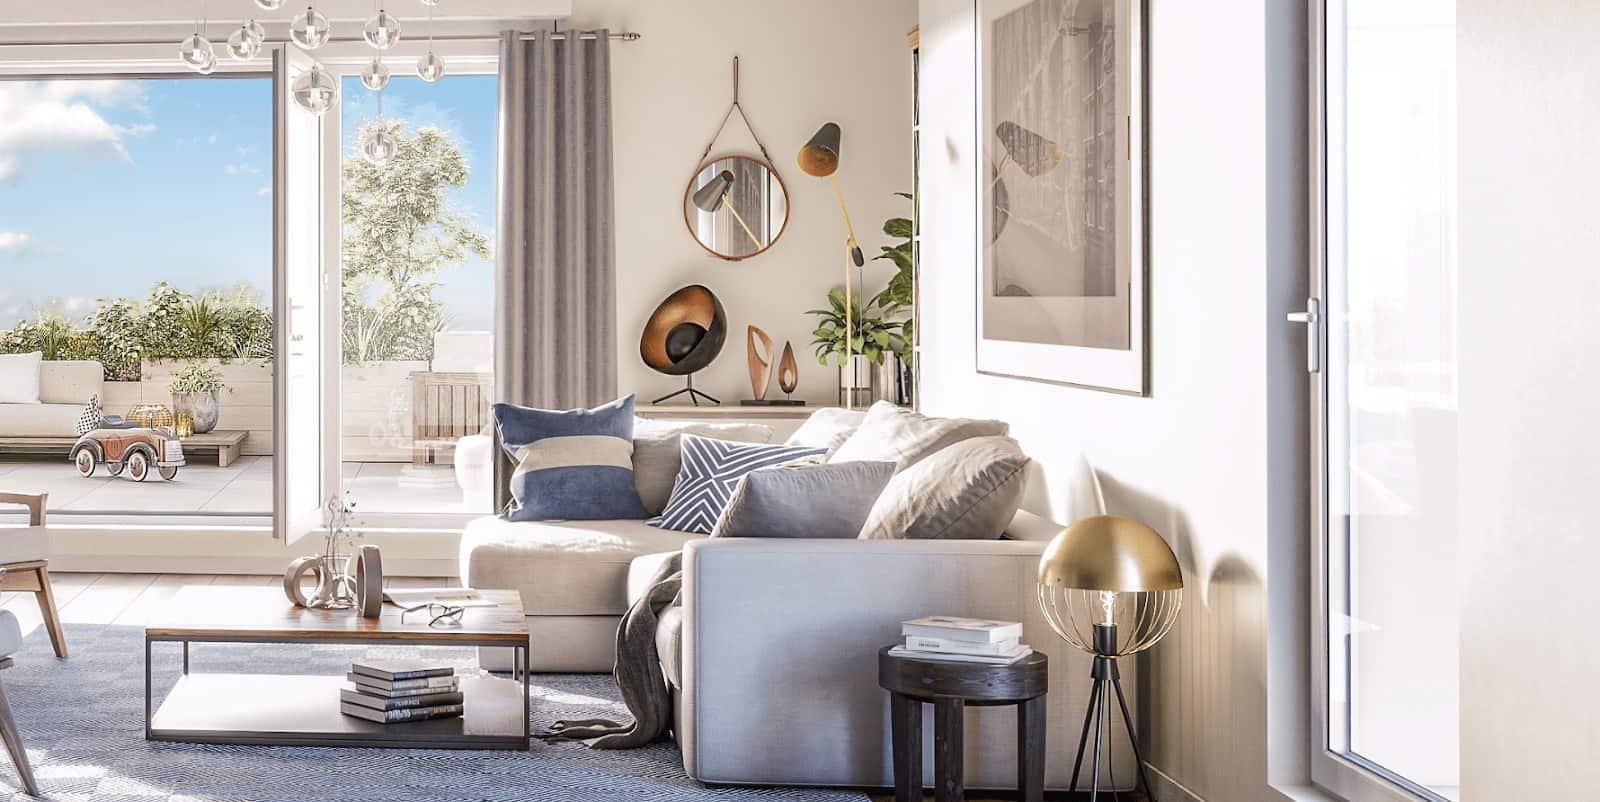 Top 26 Mẫu Thiết Kế Nội Thất Tây Âu Đẹp Ấn Tượng Nhất -  - Mẫu thiết kế nội thất đẹp | Nội thất phong cách tây âu 69